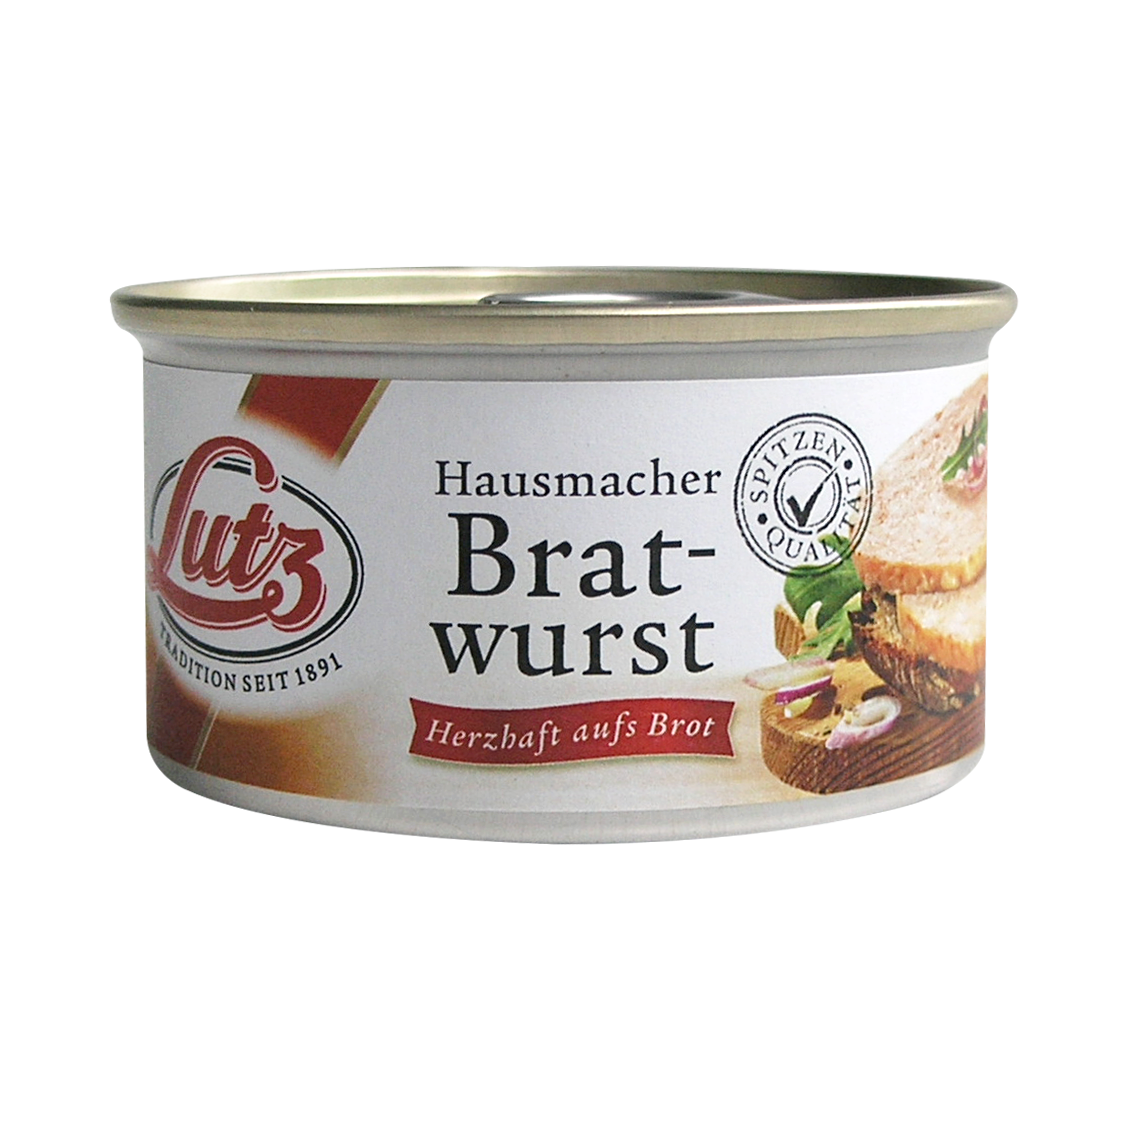 Dose_Hausmacher_Bratwurst